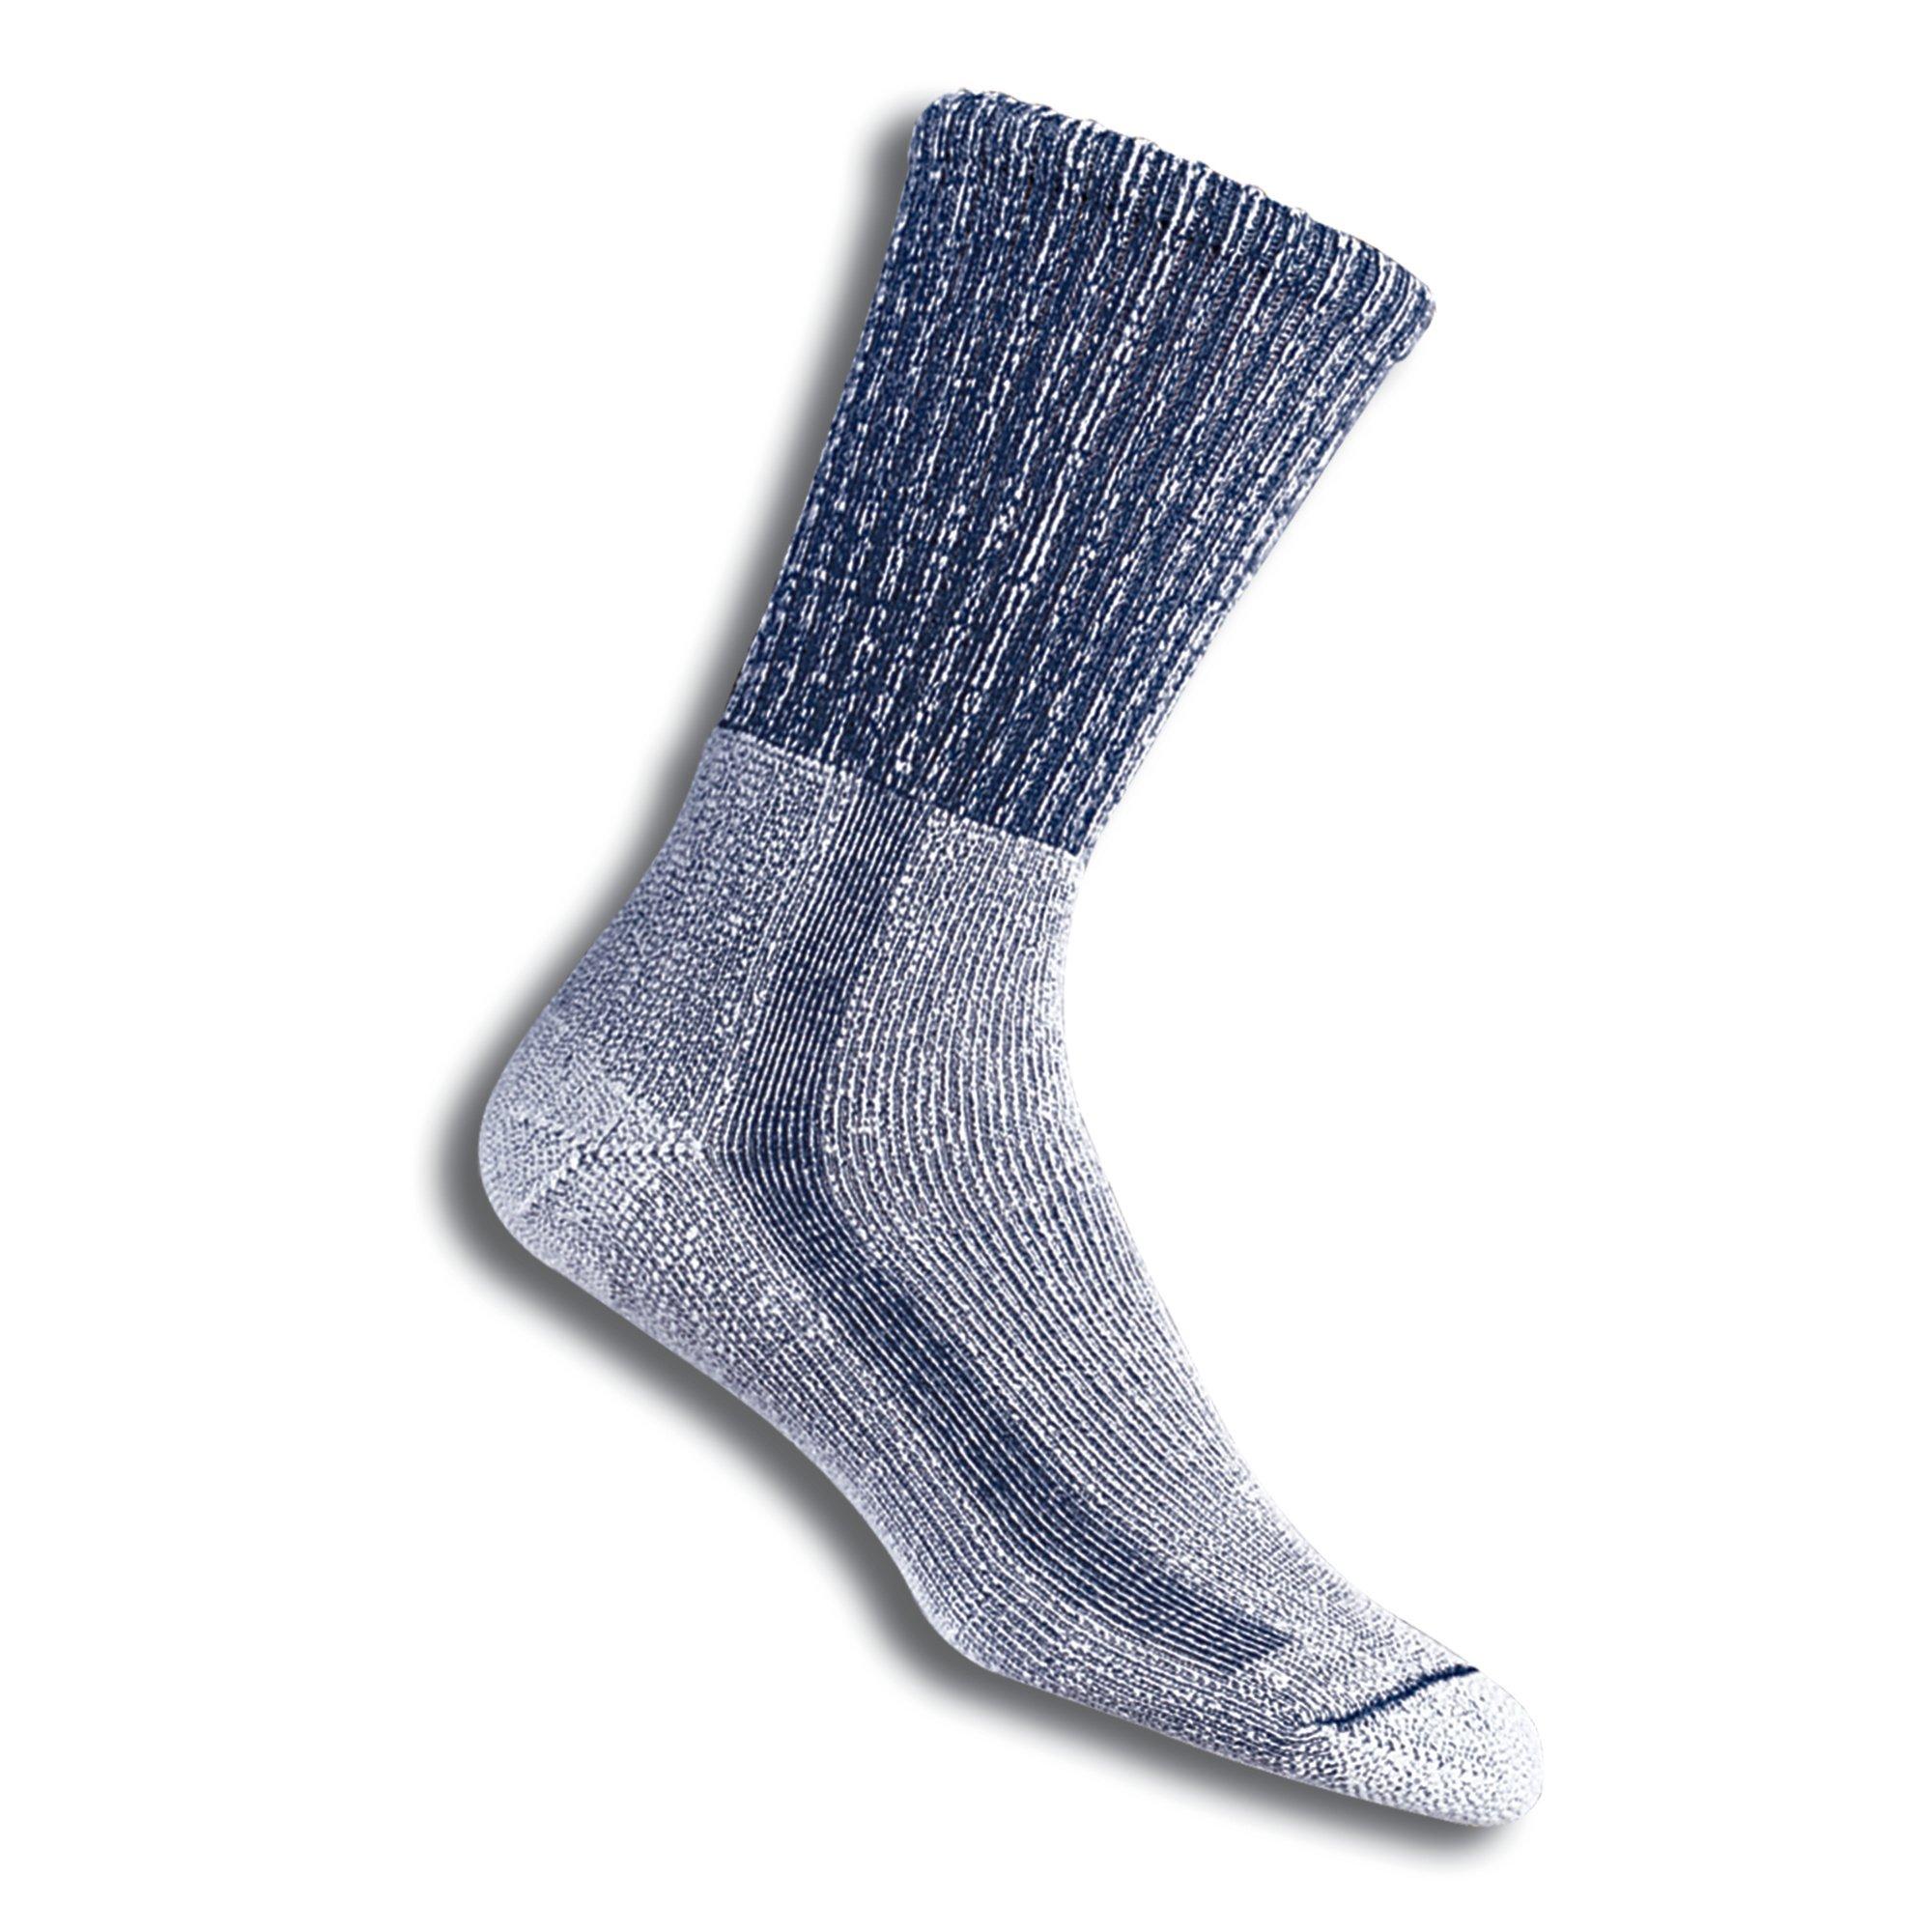 18482b65097 Best Rated in Men s Outdoor Recreation Socks   Helpful Customer ...